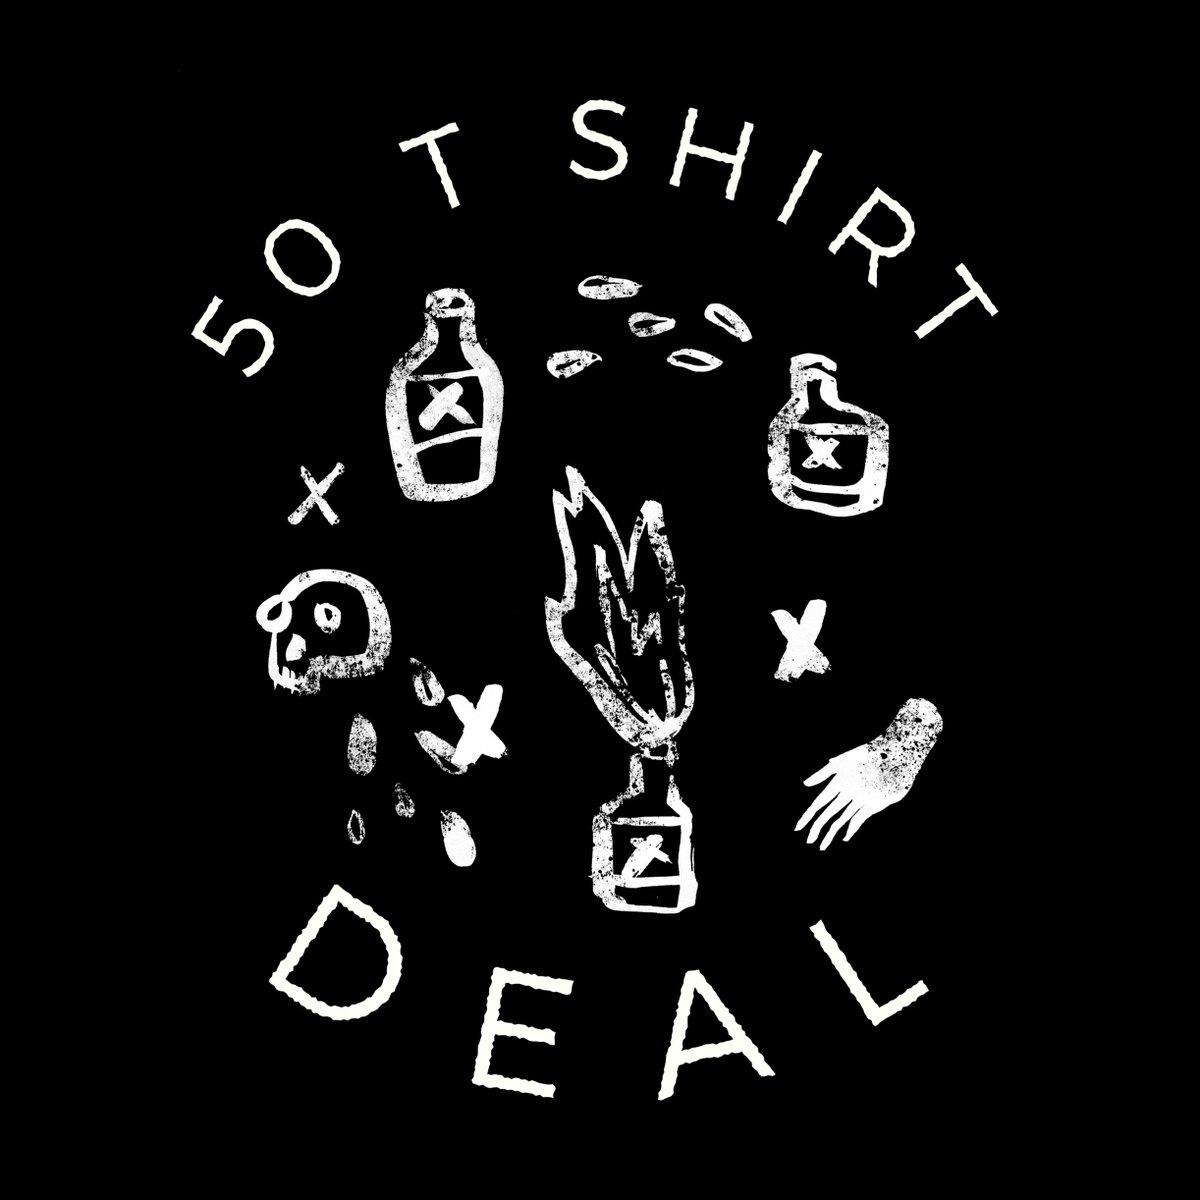 Design your own t shirt cheap uk - 0 Replies 1 Retweet 0 Likes